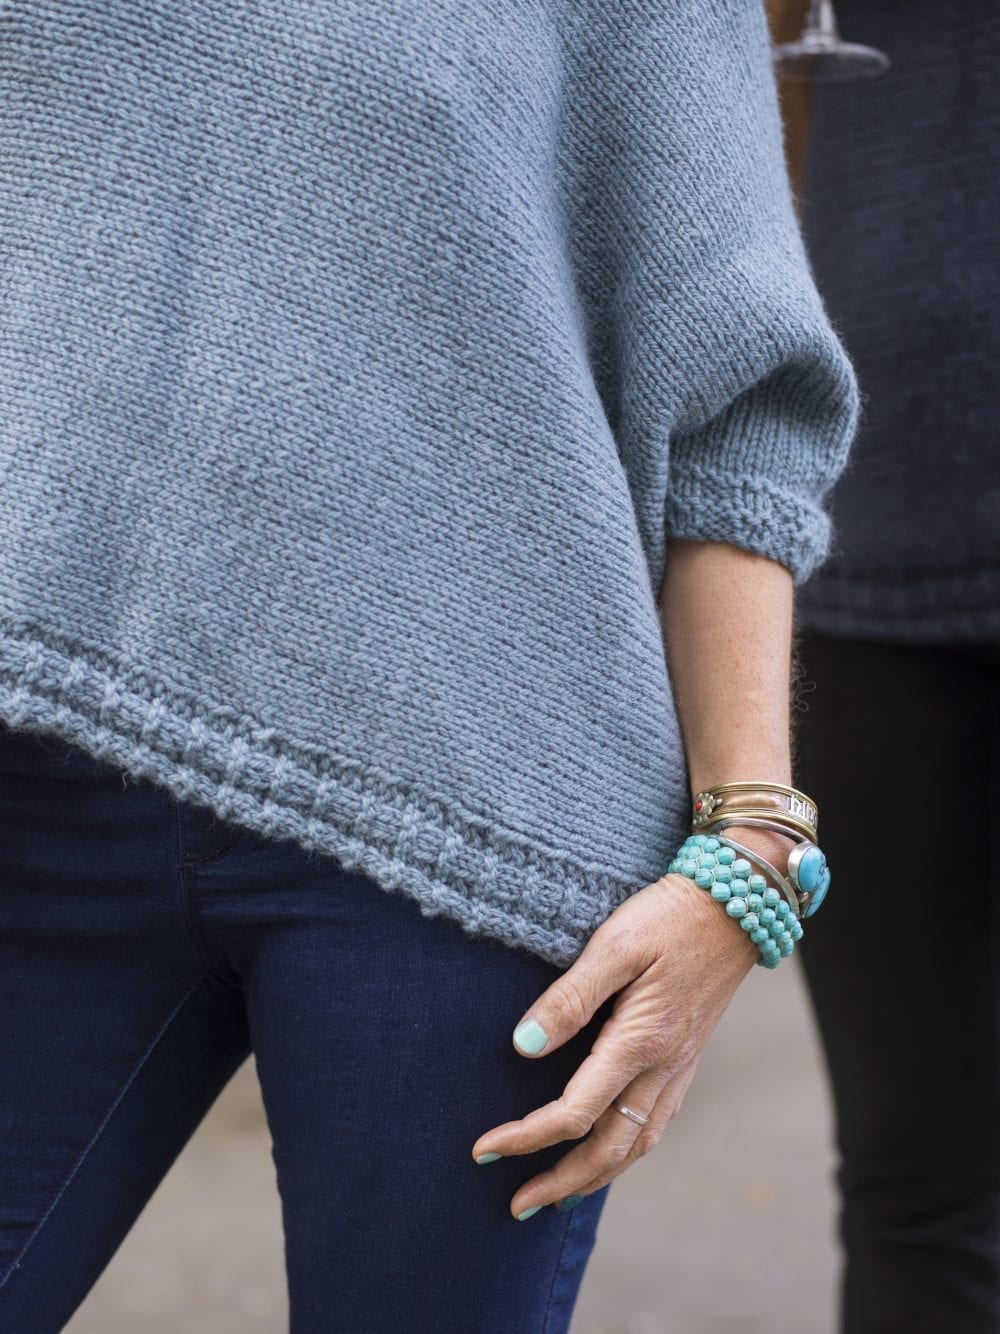 The Woven Jennifer Tunic Vest Knit Kit